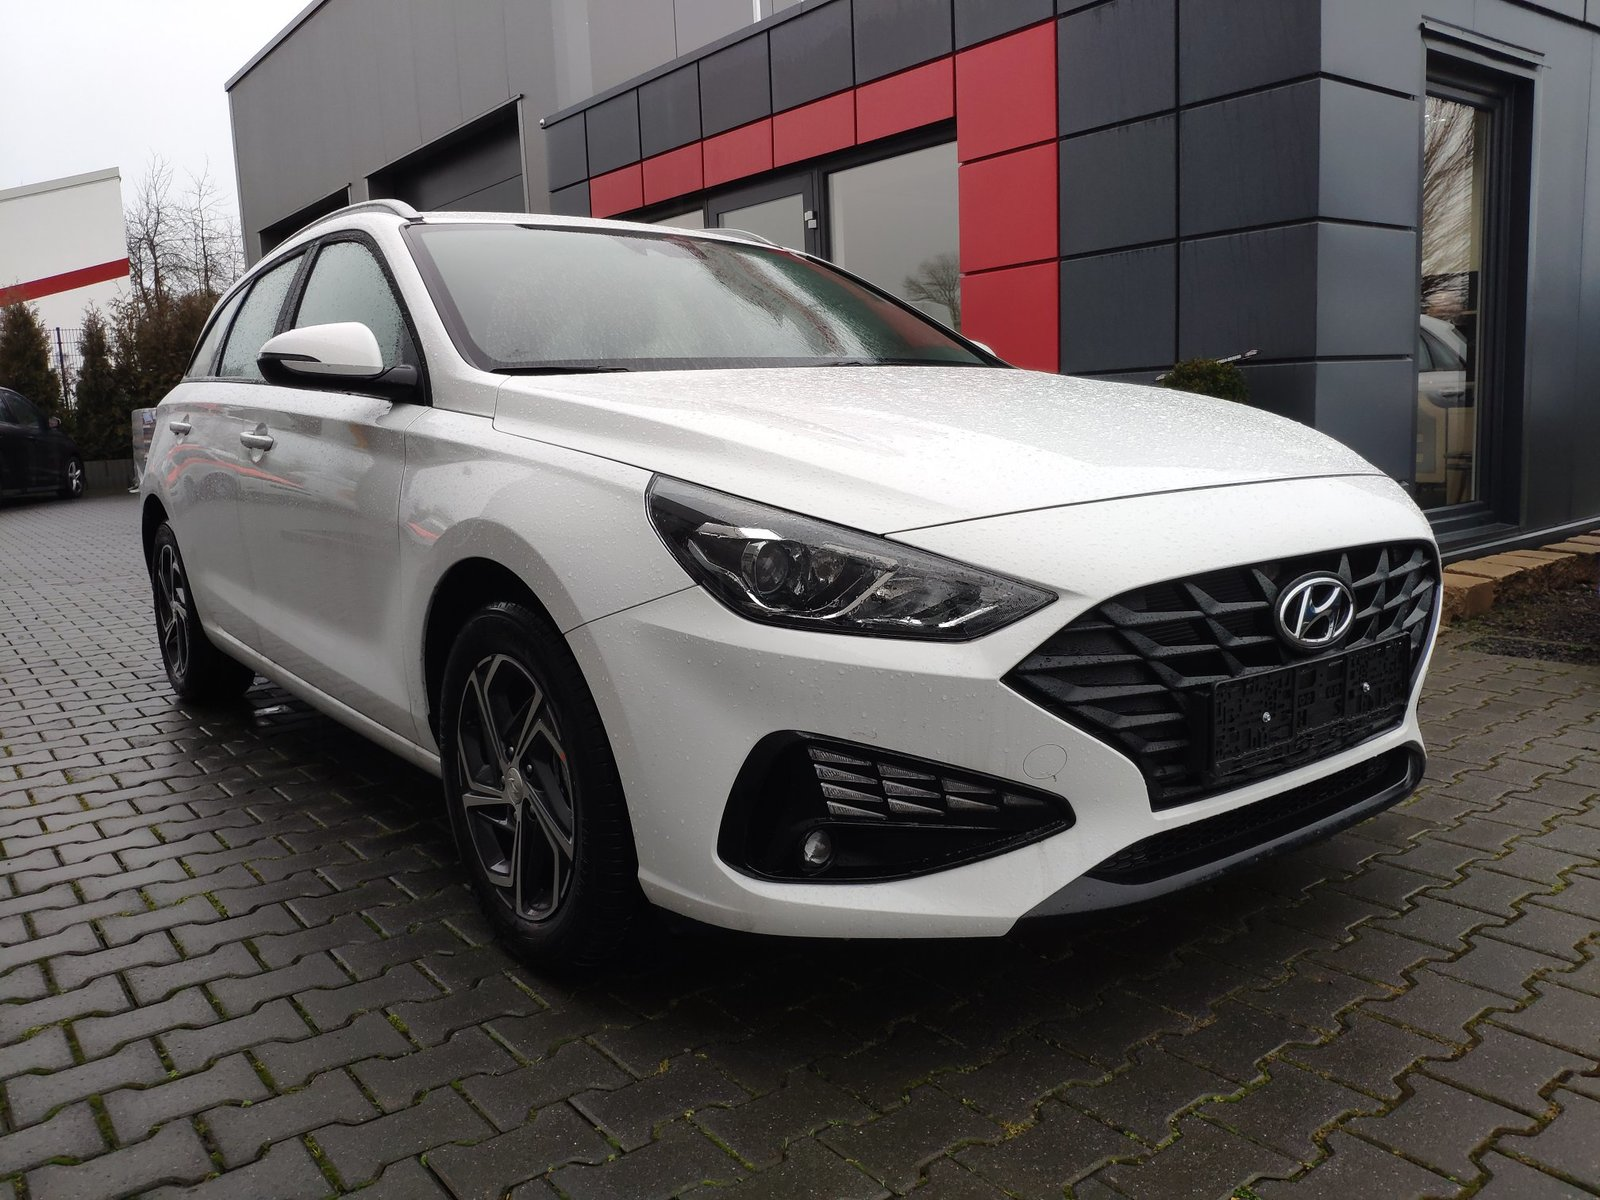 HYUNDAI I30 Kombi 159 PS Sofort Verfügbar! LED*Cam*APP Autosoft BV, Enschede